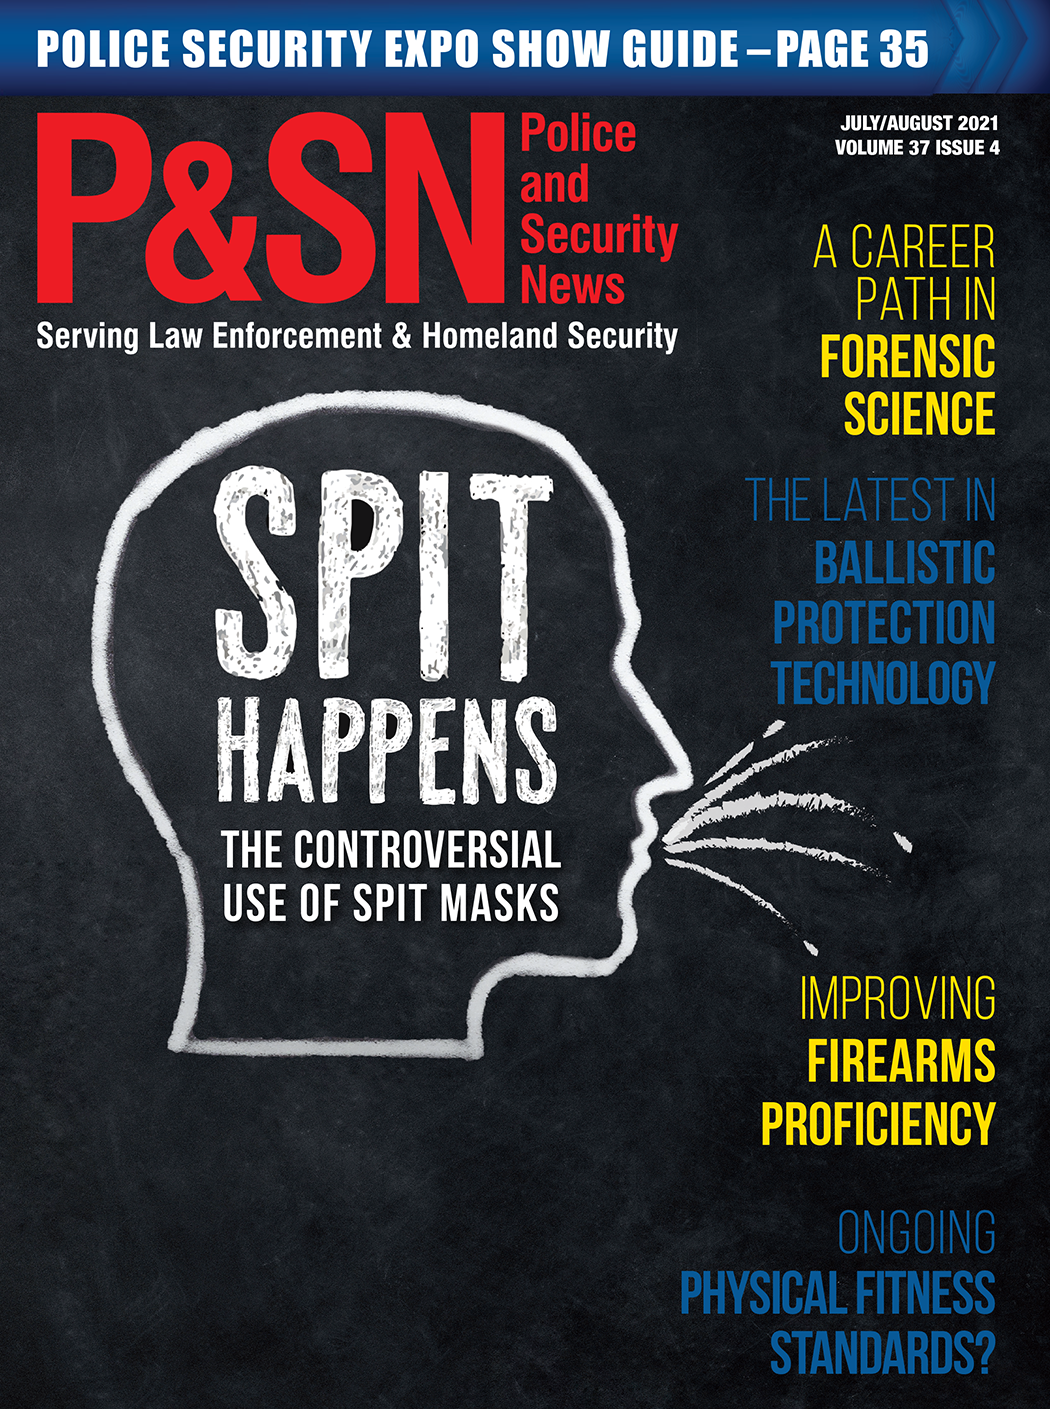 P&SN Magazine Cover